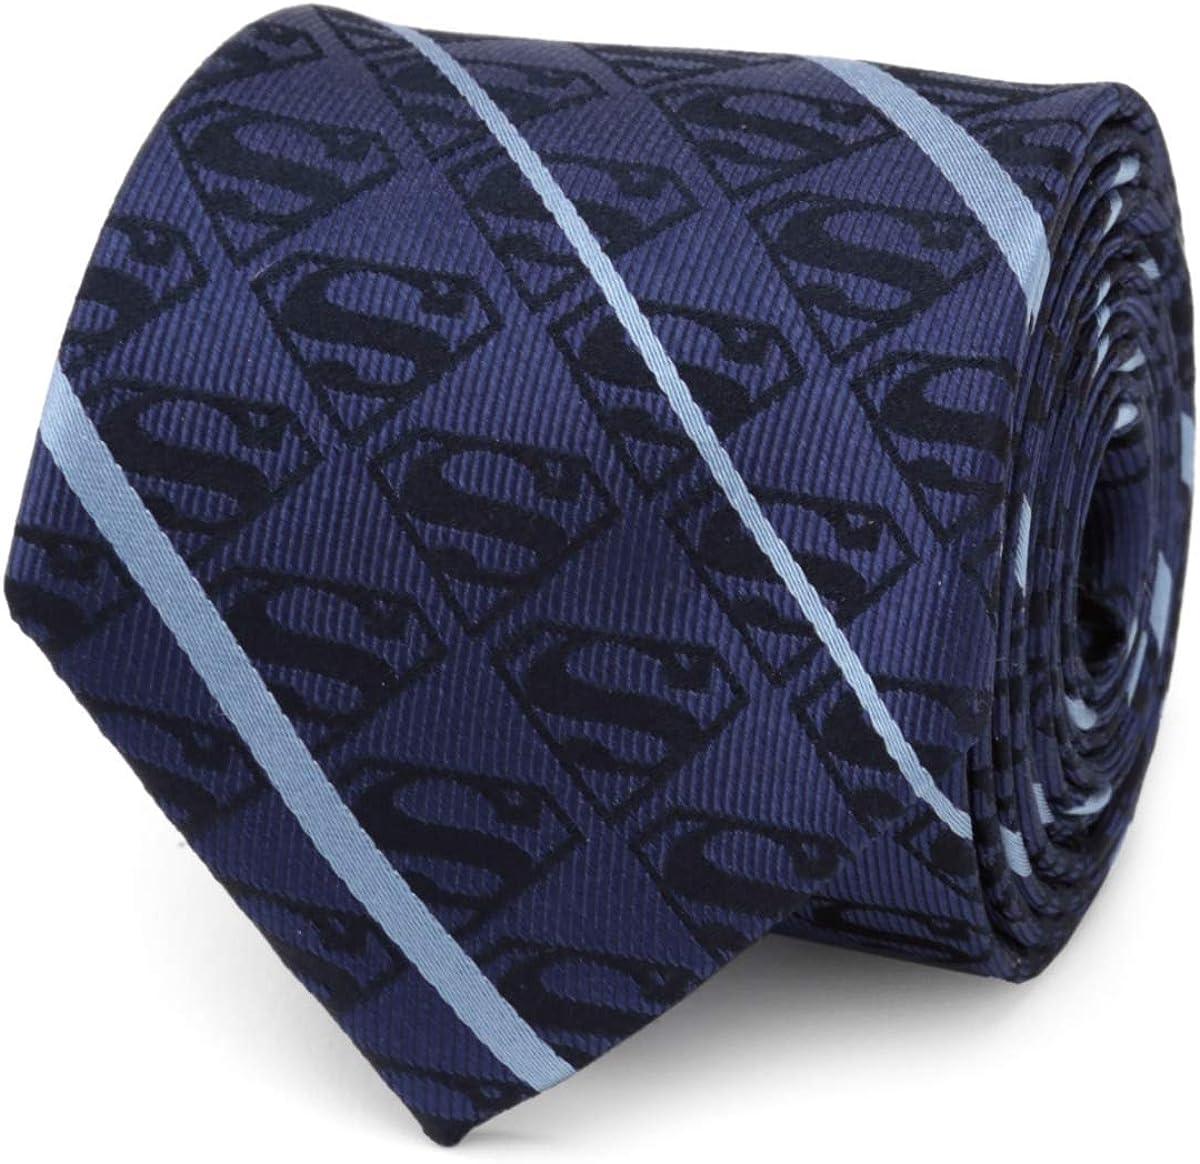 Superman Stripe Pattern Finally popular brand Blue Tie Men's Popular Silk